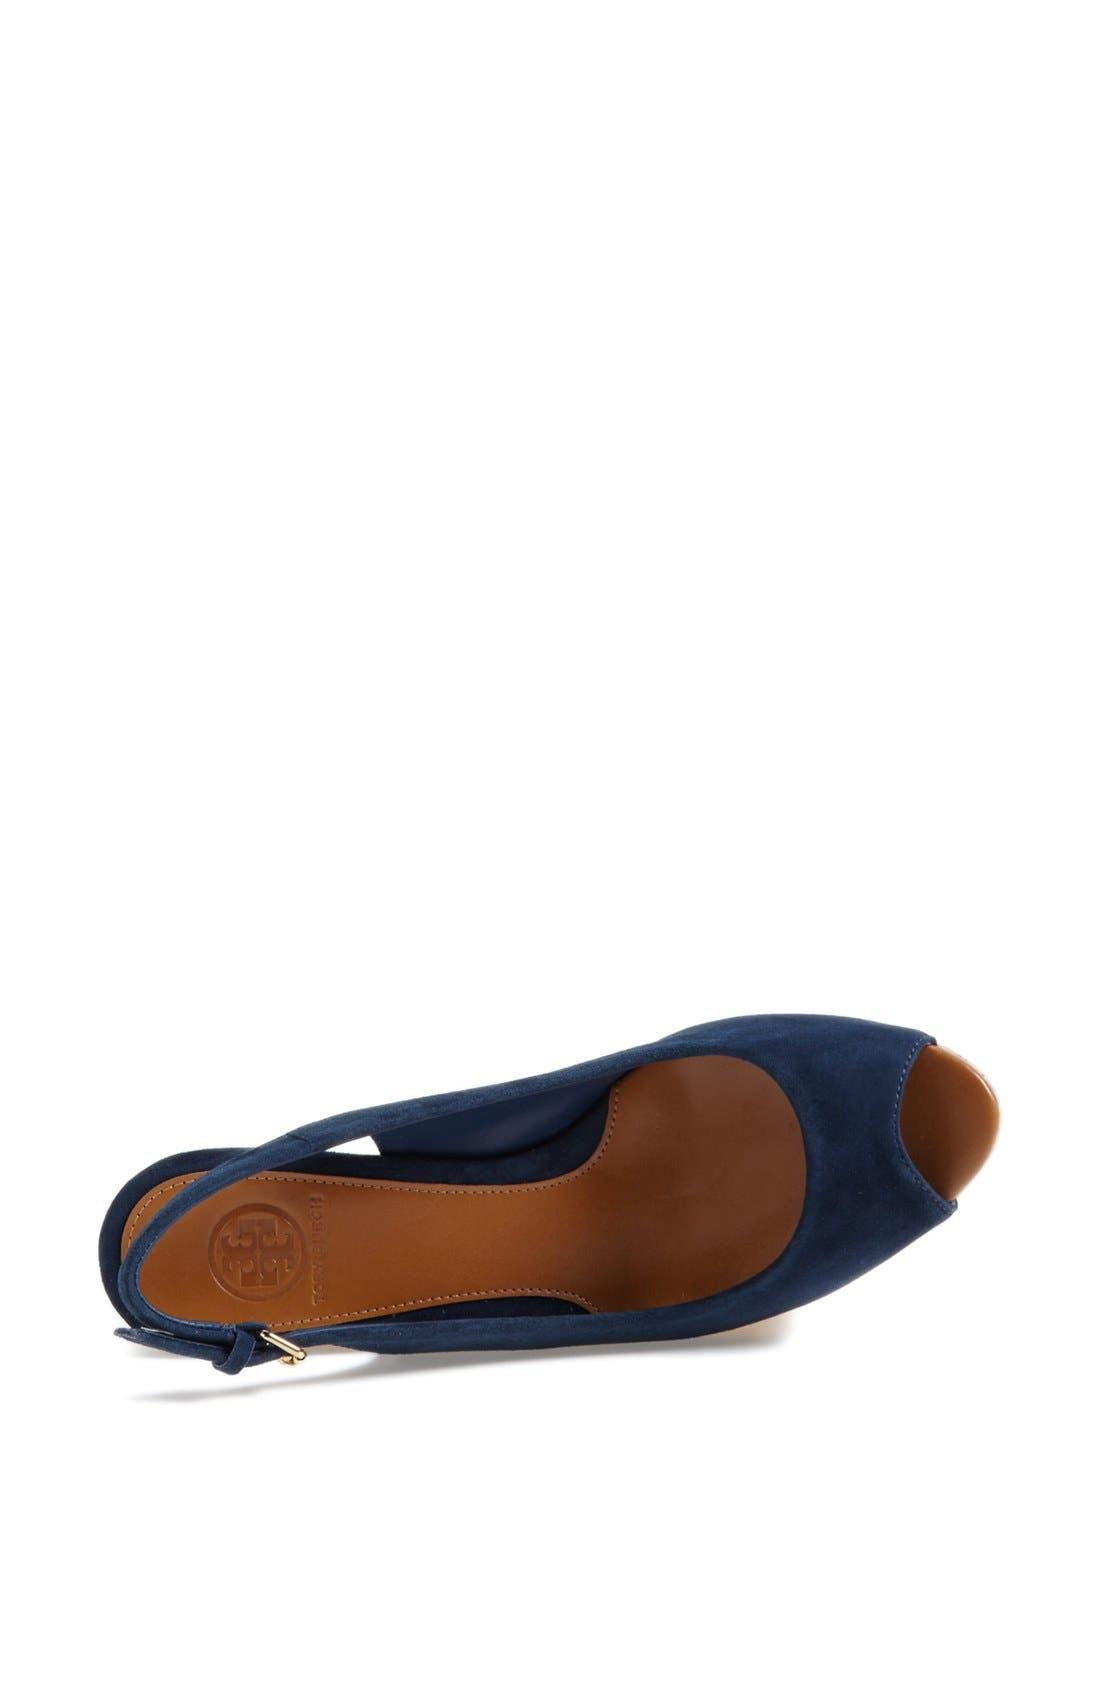 Alternate Image 4  - Tory Burch 'Rosalind' Wedge Sandal (Online Only)